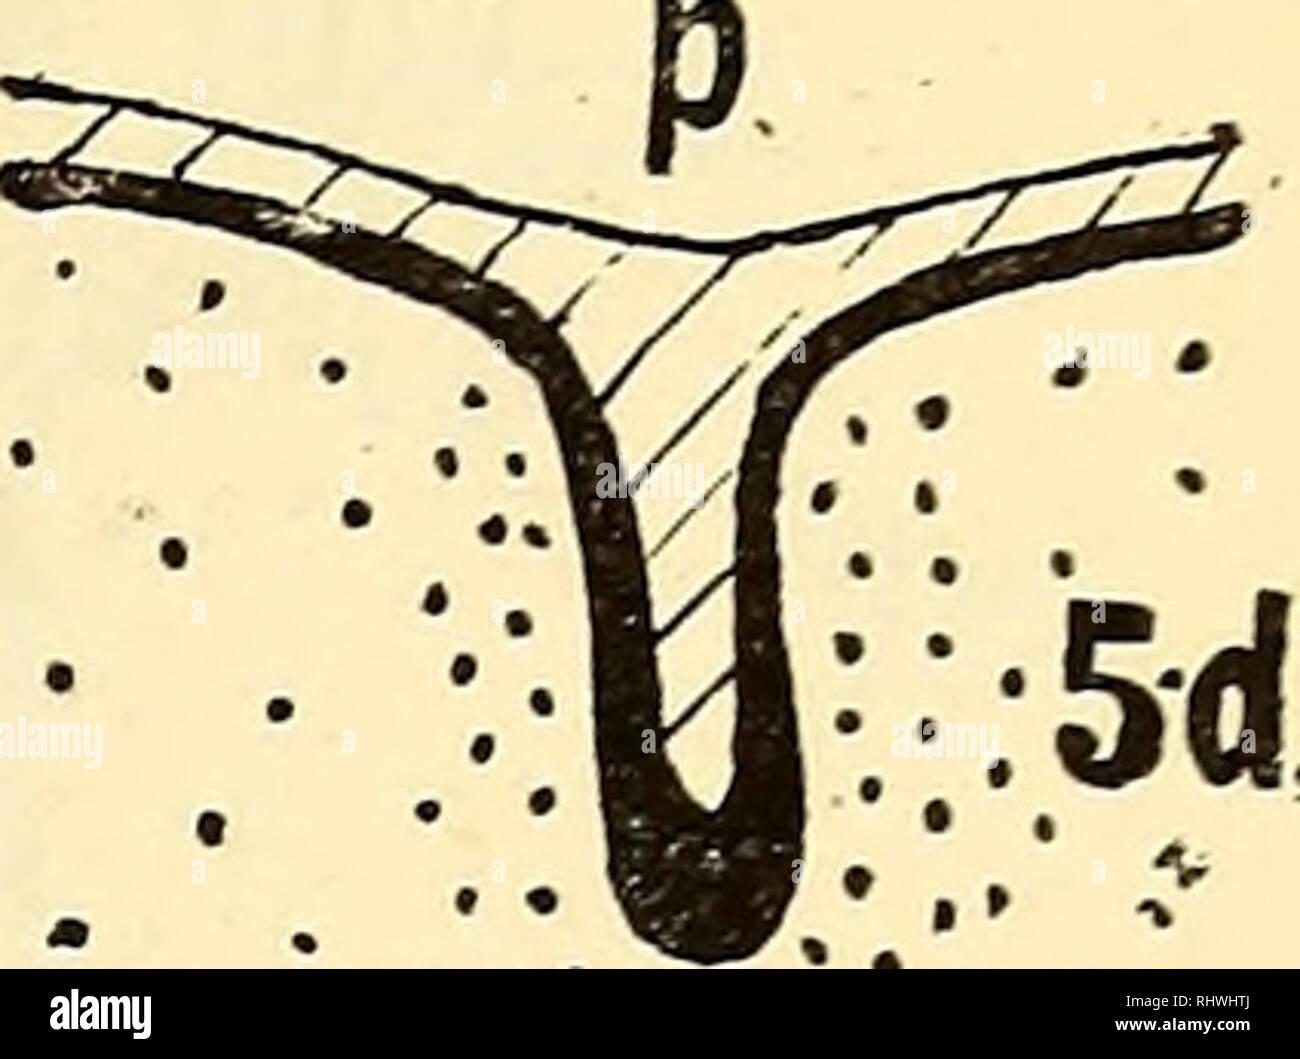 ". Bergens Museums aarbok. Science; Natural history. Fig. 5 (a, b, c, d). ""D"" Tversnit gjennem venstre mammarorgan (skaaret caudal—cranial) 5 a, b, c, d — snit 85, 87, 96, 100. Sort — storkjernede celler. Skravert — polygonale celler. Punktert — mesoderm. X 43. meget smalt nær overflaten, bare 10—20 ^., mens det nær bunden har en vidde av 200 fi. (0,2 mm.) To rekonstruktioner av det venstre anlæg viser dettes form (fig. 16 og 17, pl. II). Fra bunden av mammaranlægget sænker sig indover i mesodermet en solid utvekst, kjertelanlægget, kølleformet opsvulmet i den nedre del. Like neden- for de - Stock Image"